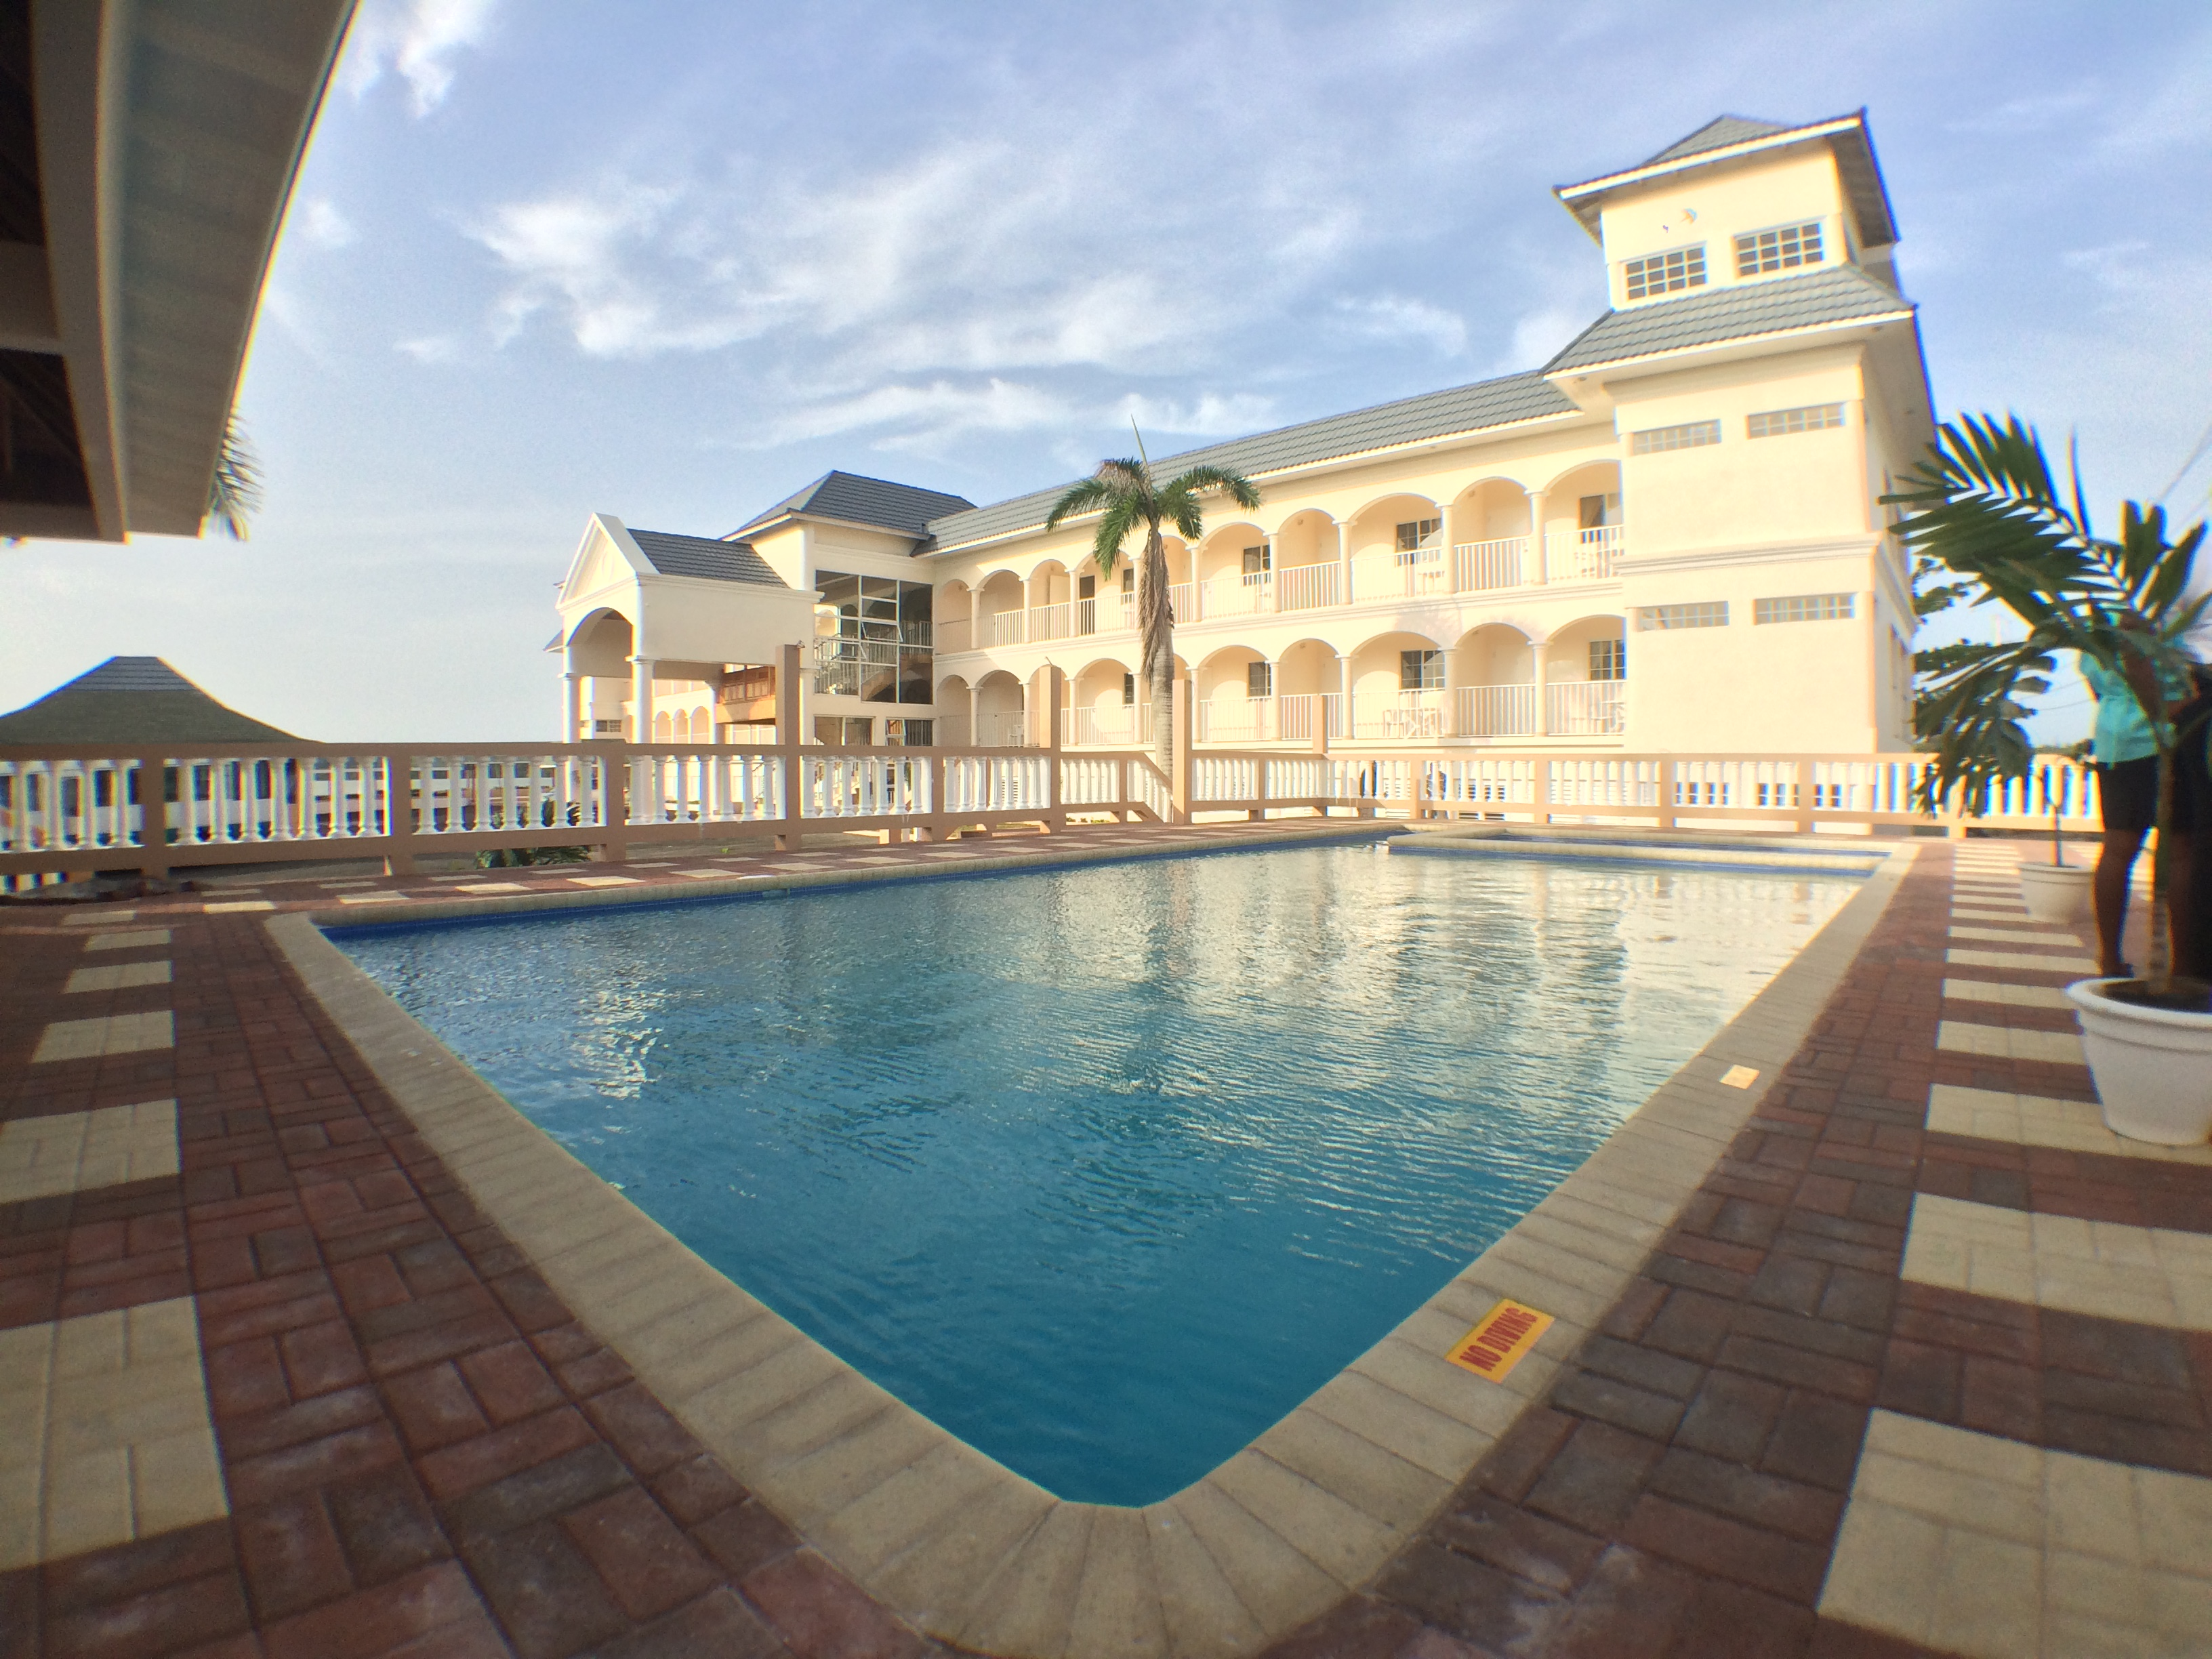 Glistening Waters Hotel & Pool